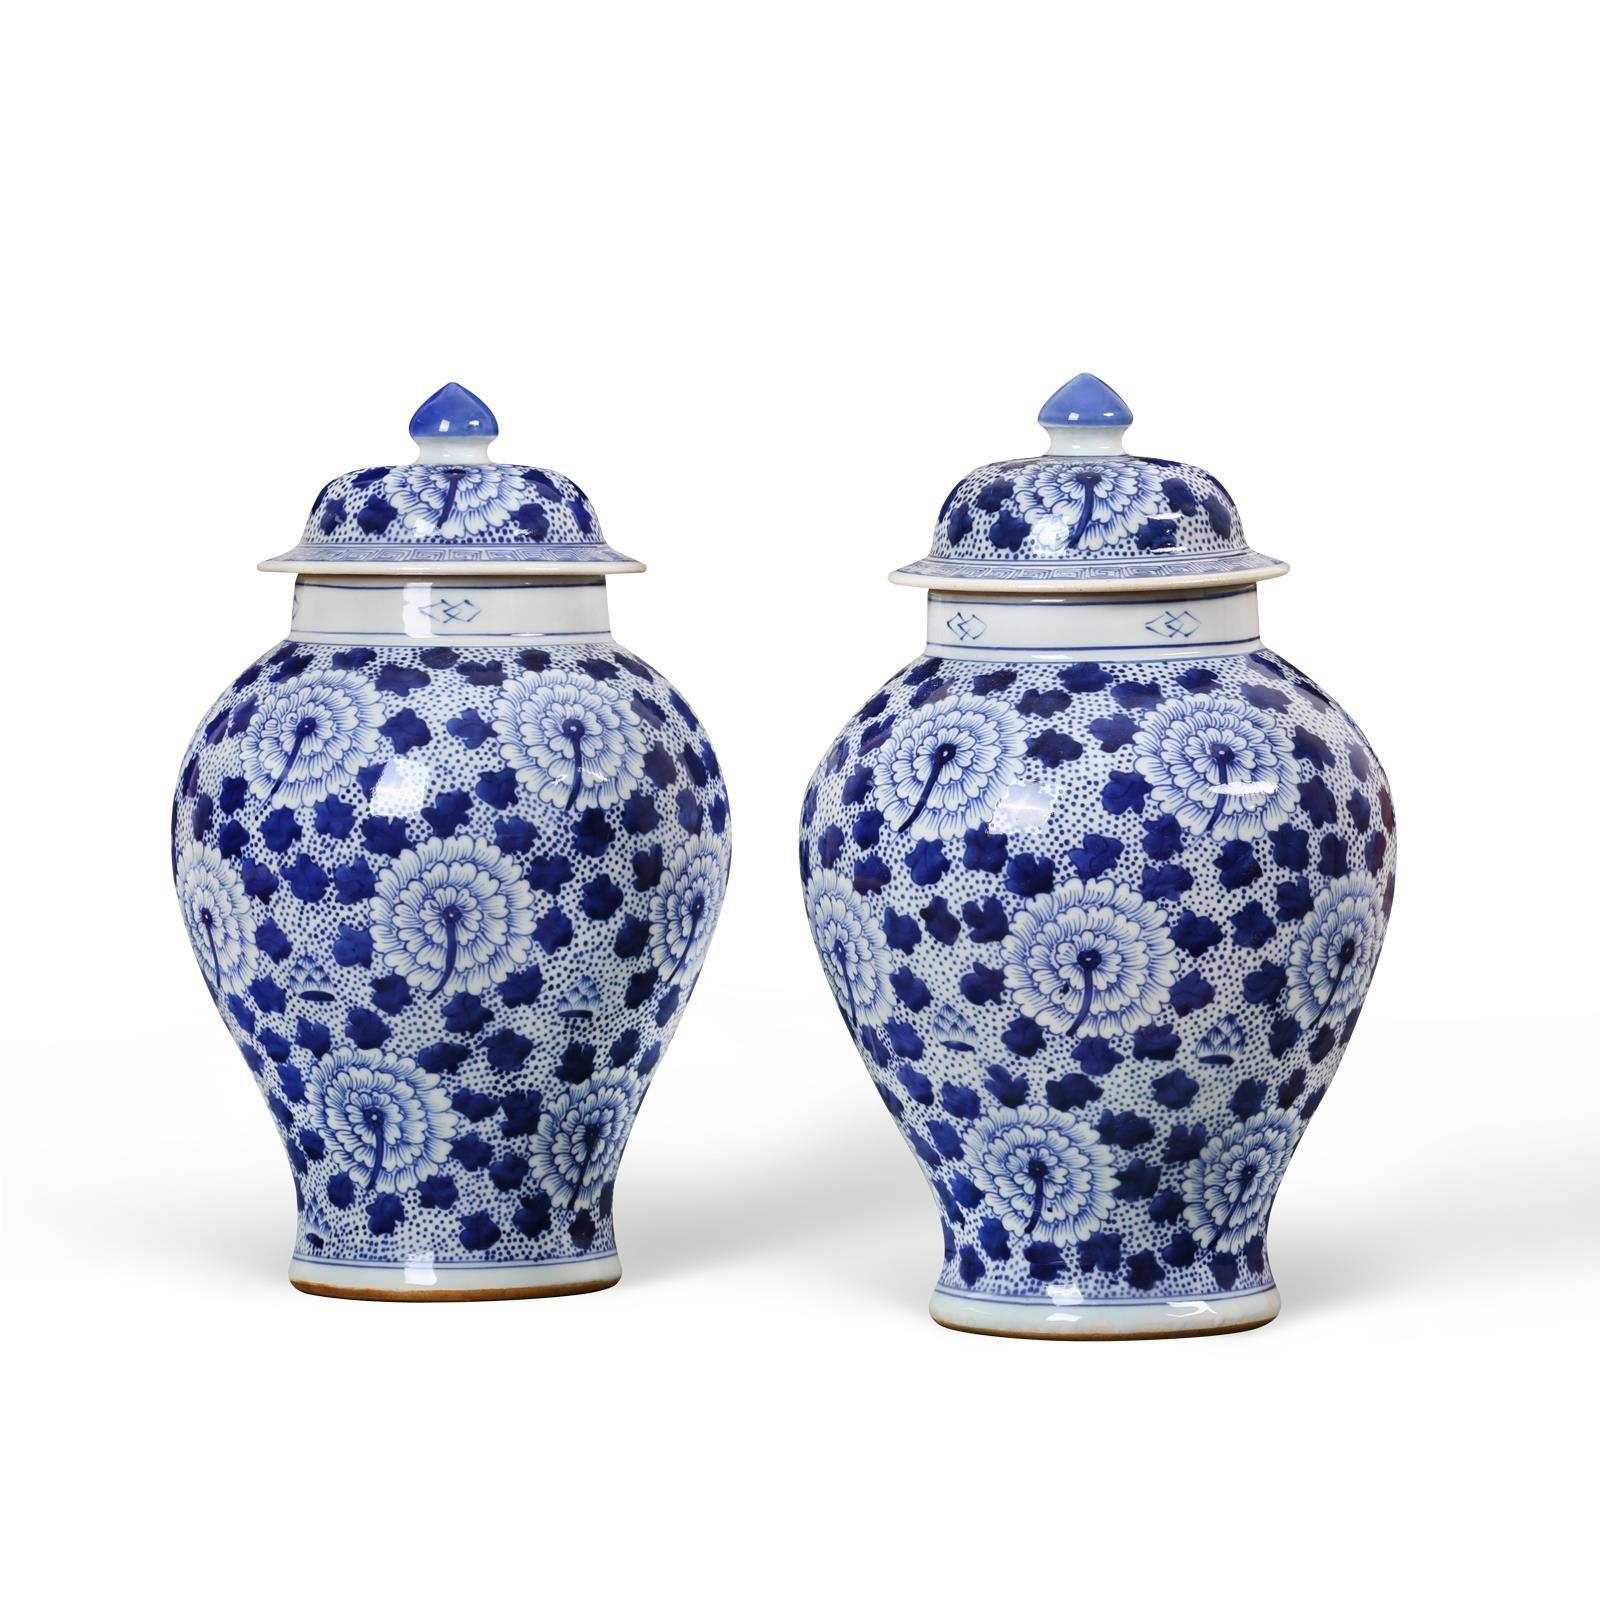 Bungalow 5 Temple jar, Blue and white, Blue